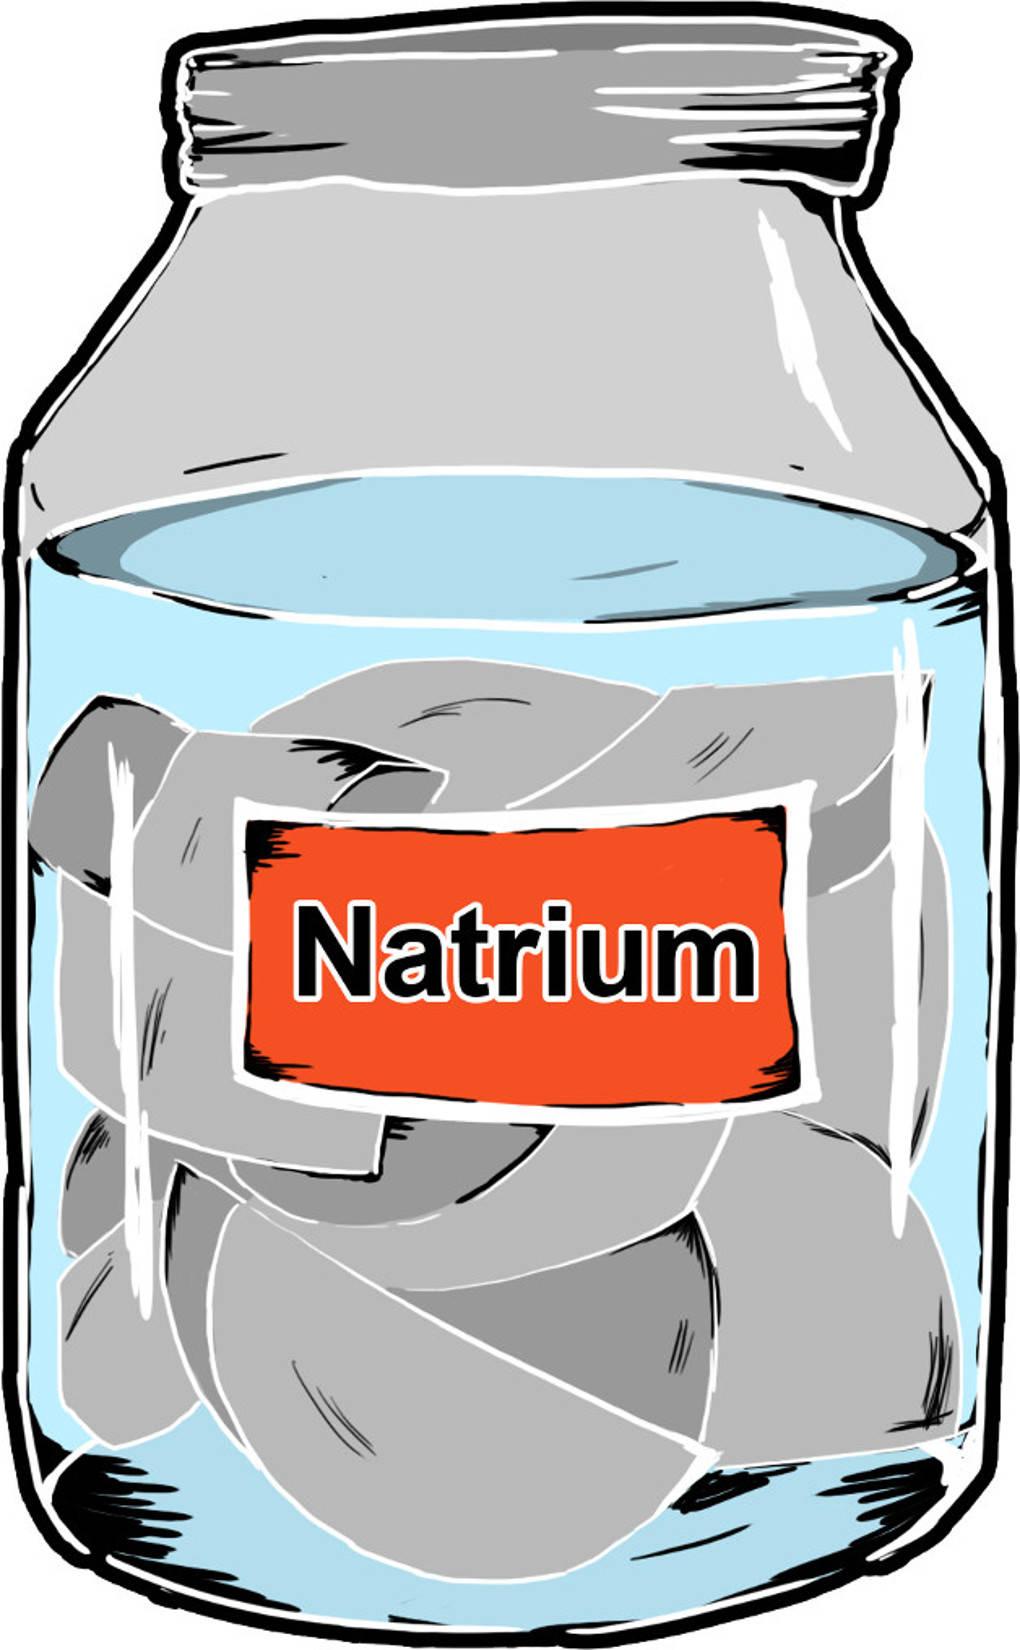 natrium-lagerung.jpg